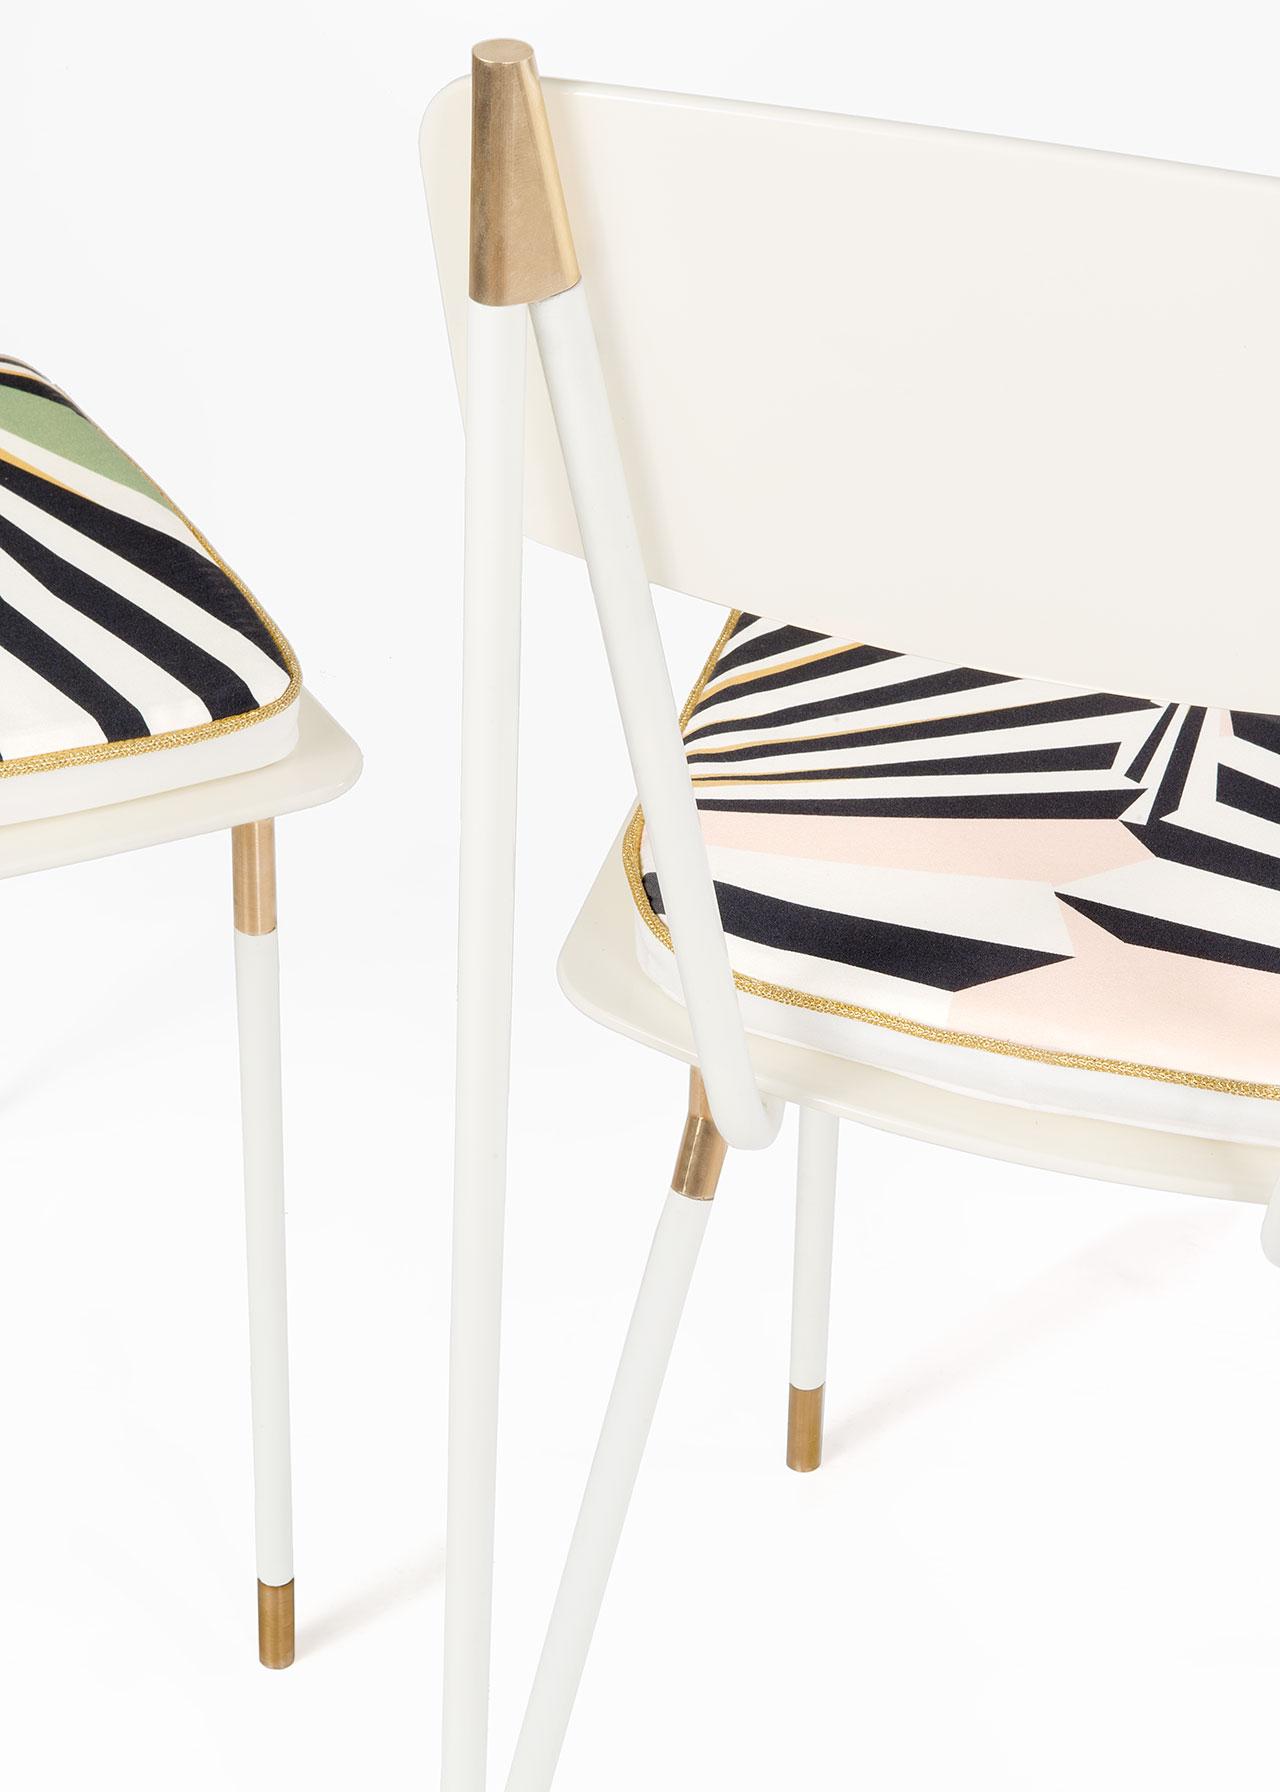 Derek Castiglioni,Aquiloni Collection -Chair.42x 42x 85cm.